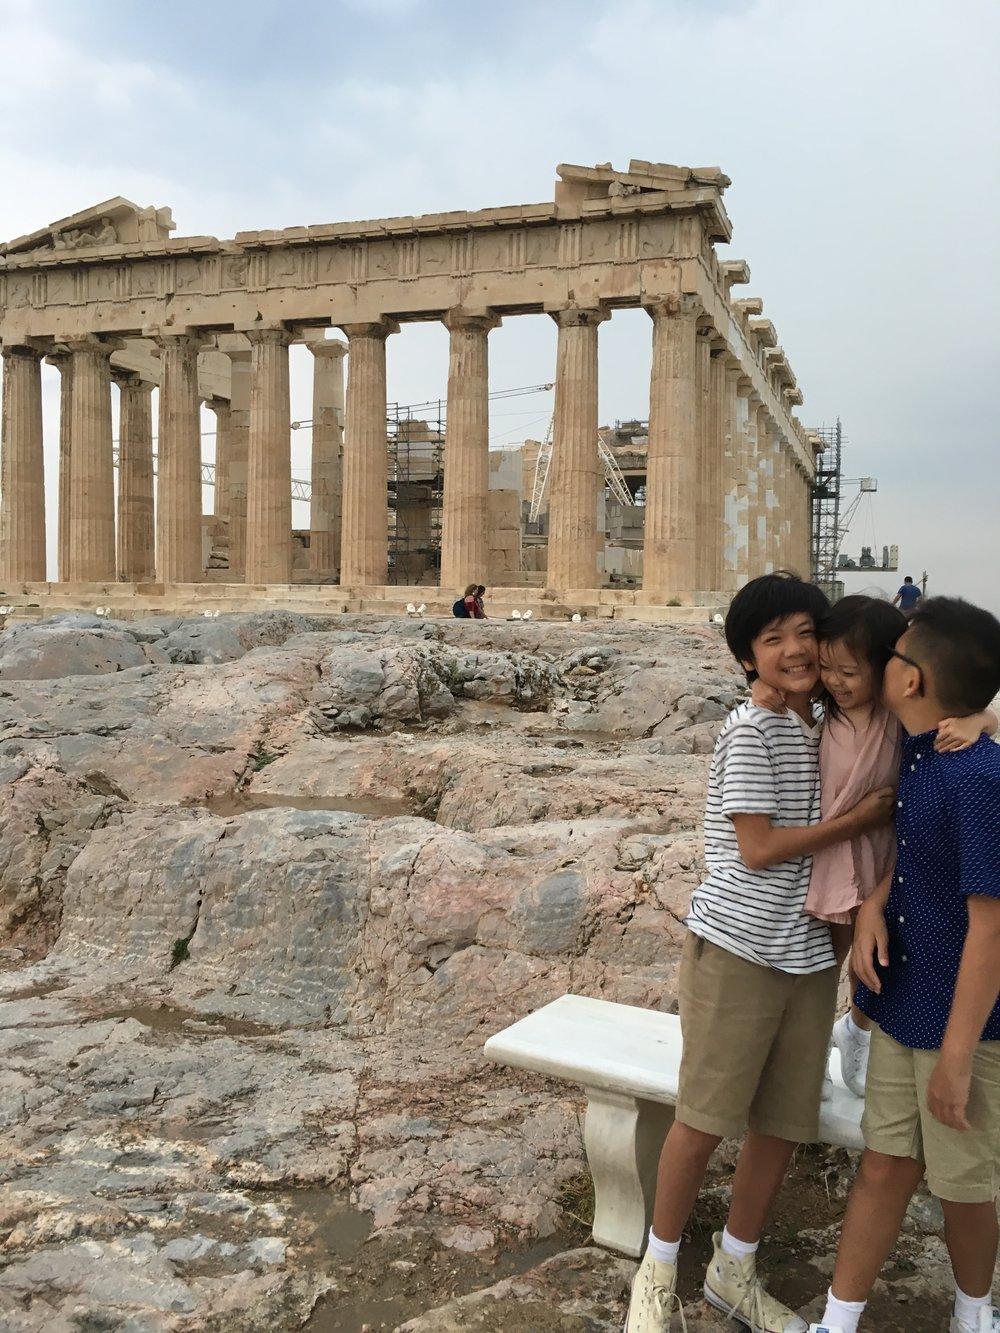 Acropolis with kids on meethaha.com